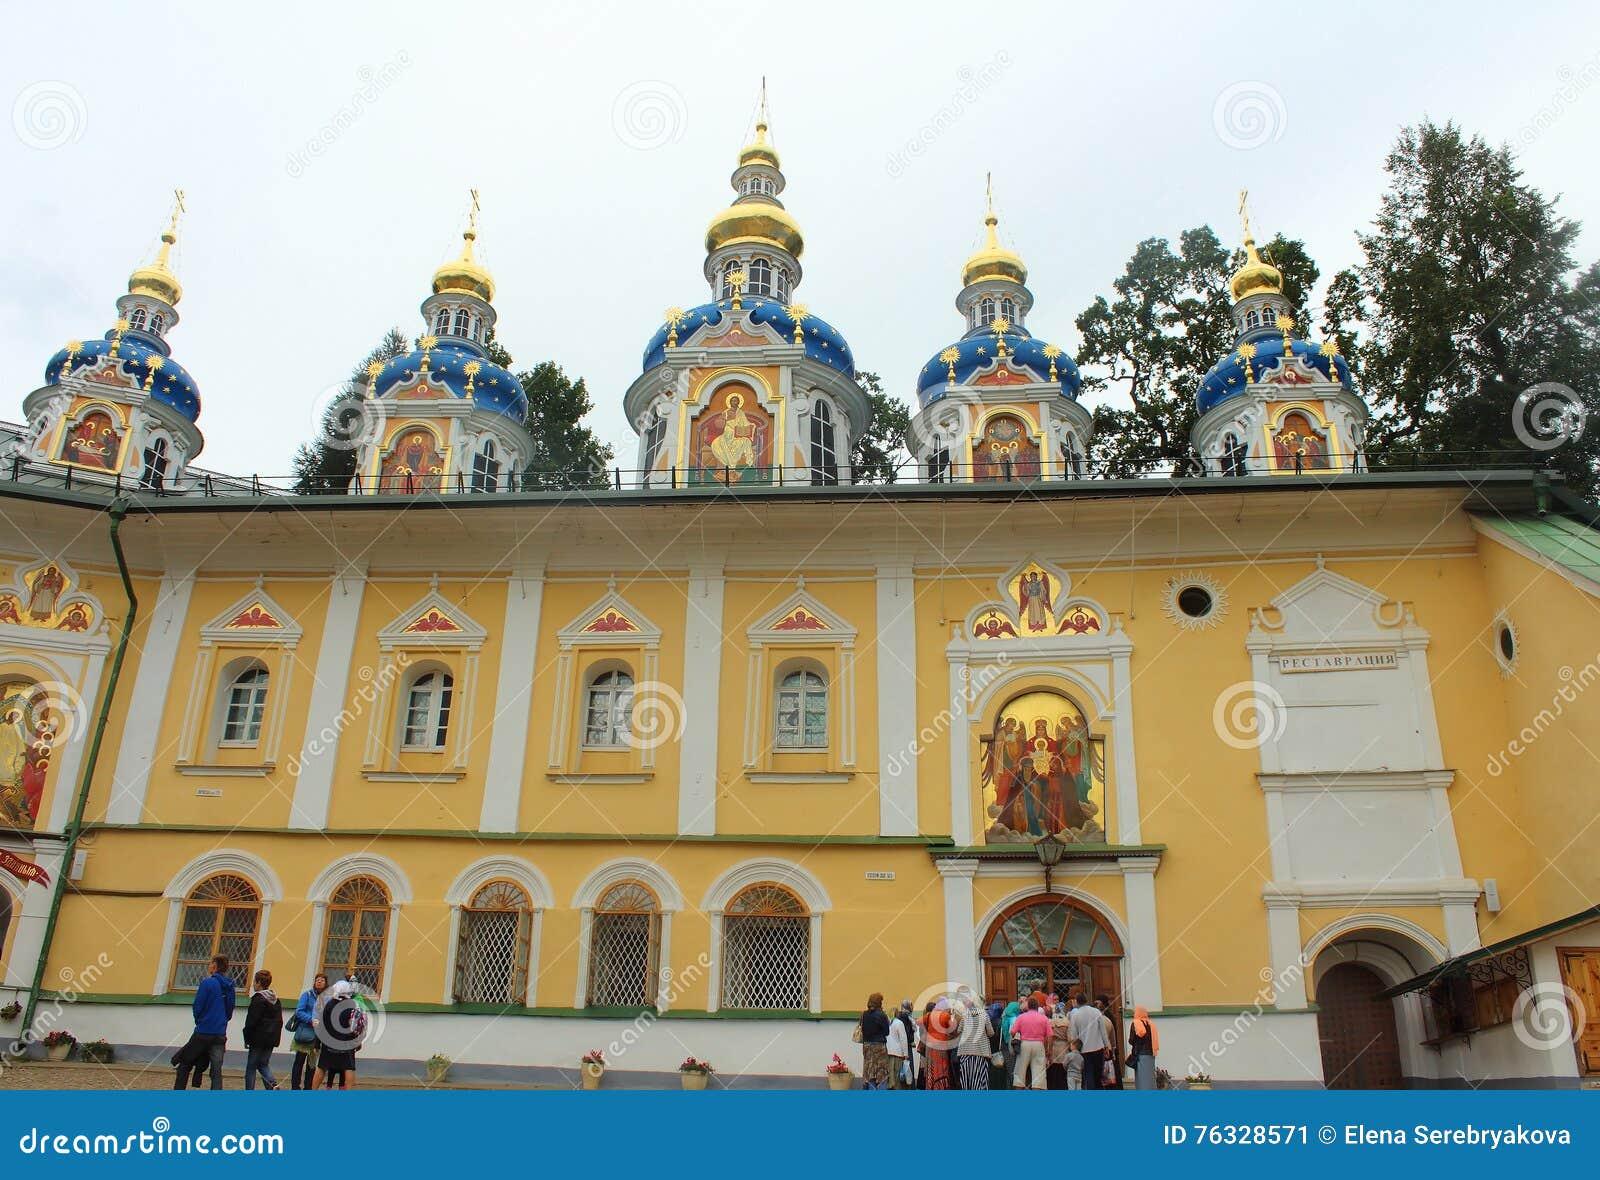 Pskovo-Pechersky Monastery: how to get there 4